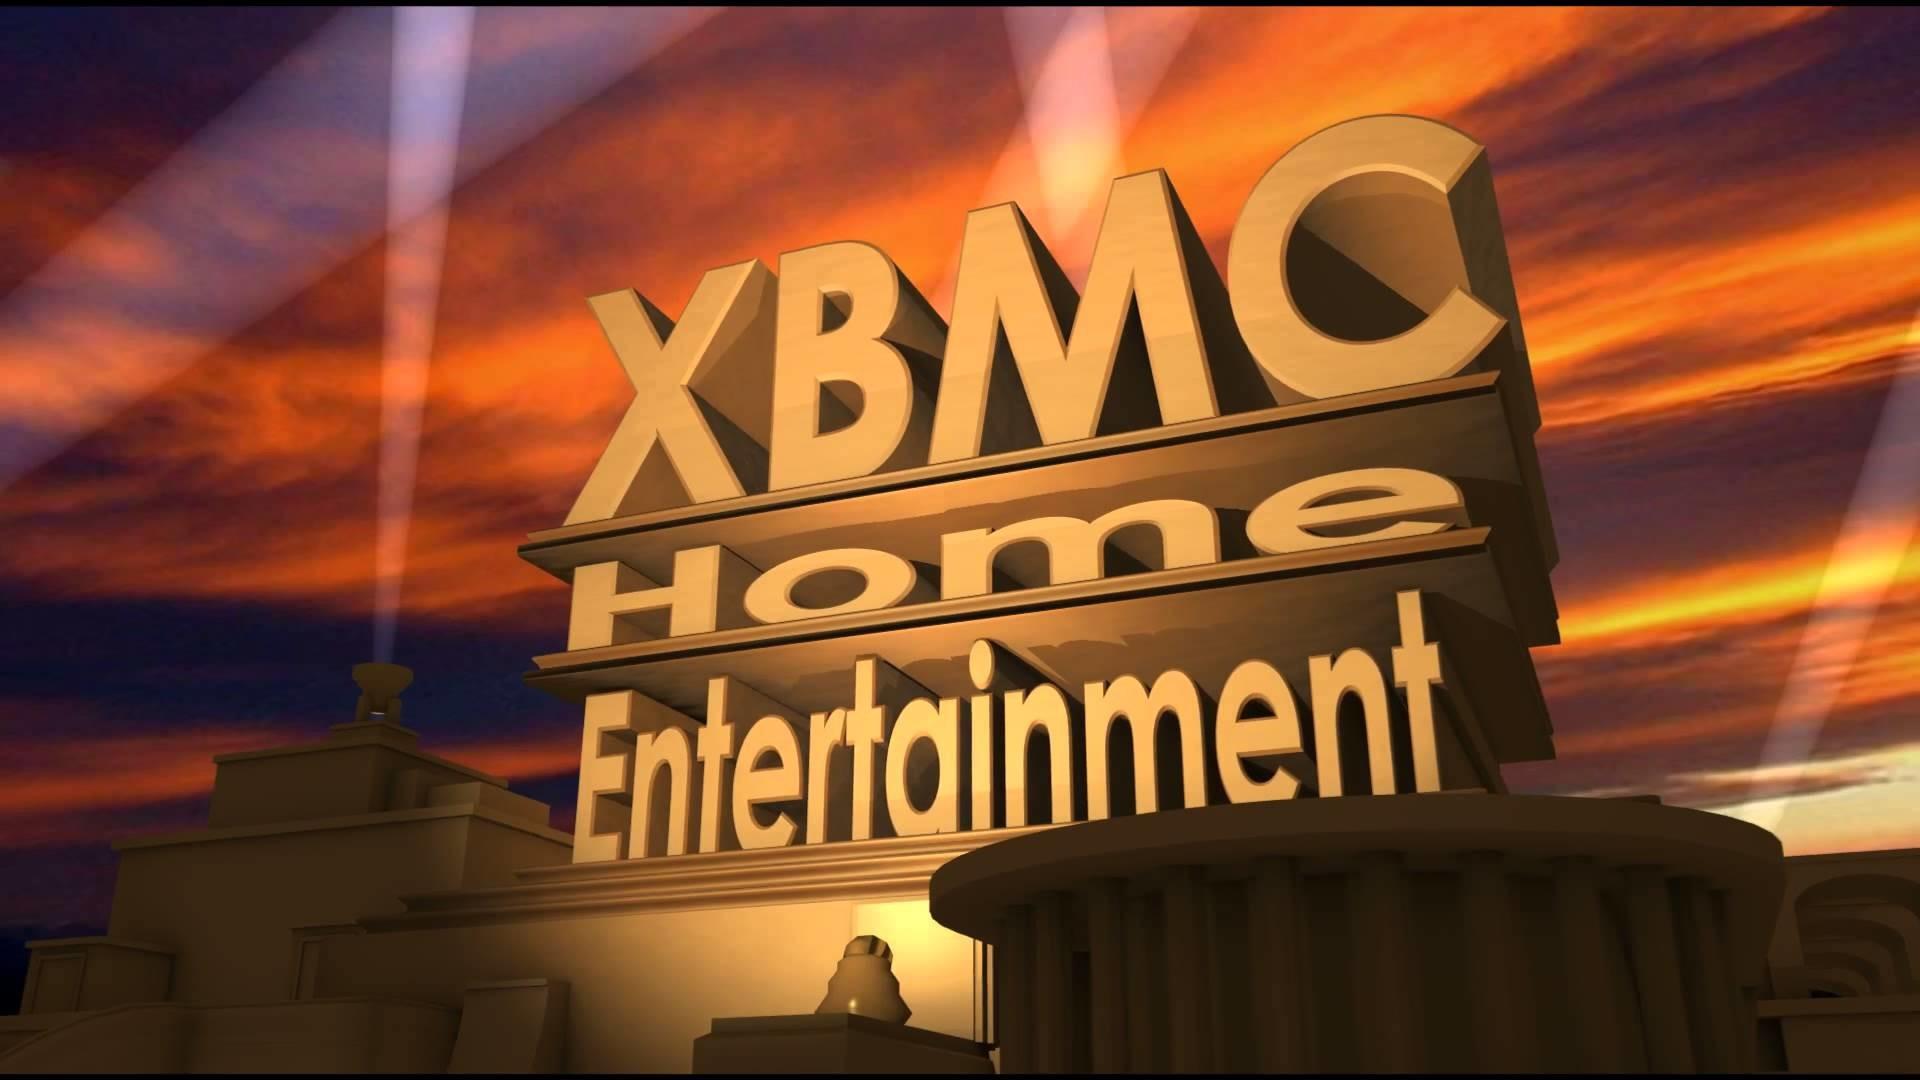 XBMC Cinema Experience Intro – YouTube